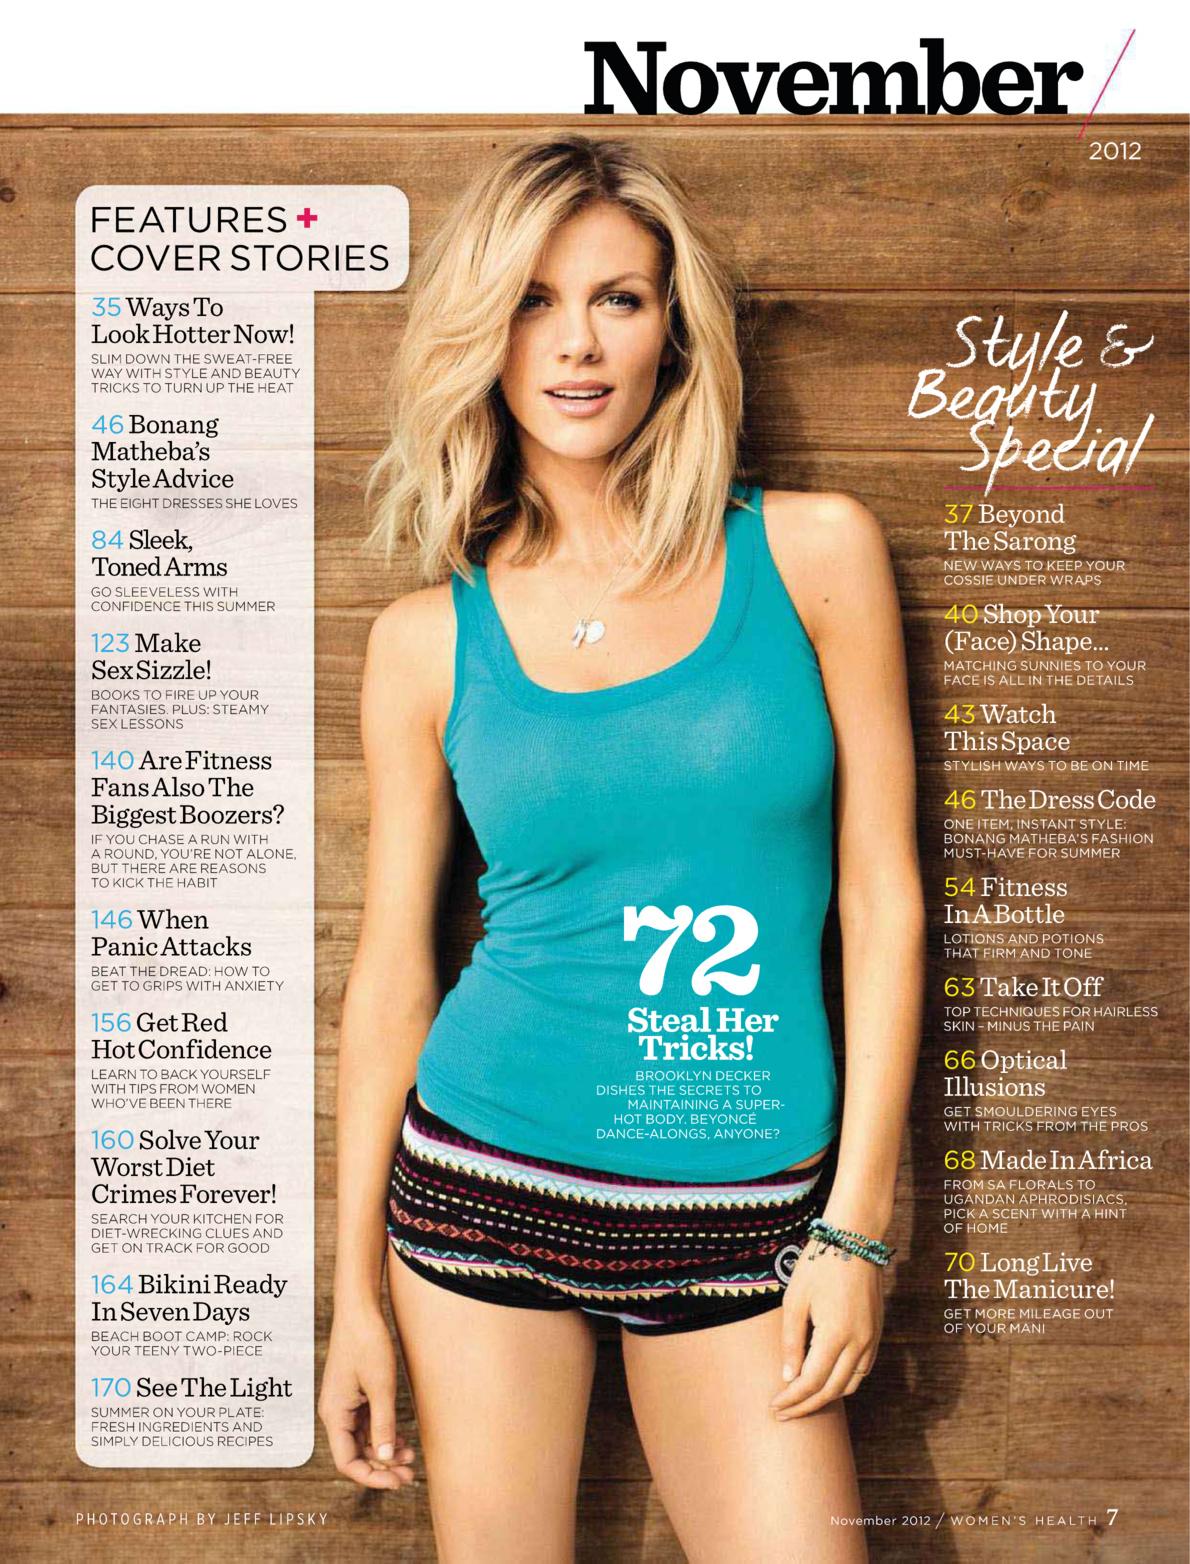 Brooklyn Decker hot in shorts for Womens Health-07 - GotCeleb